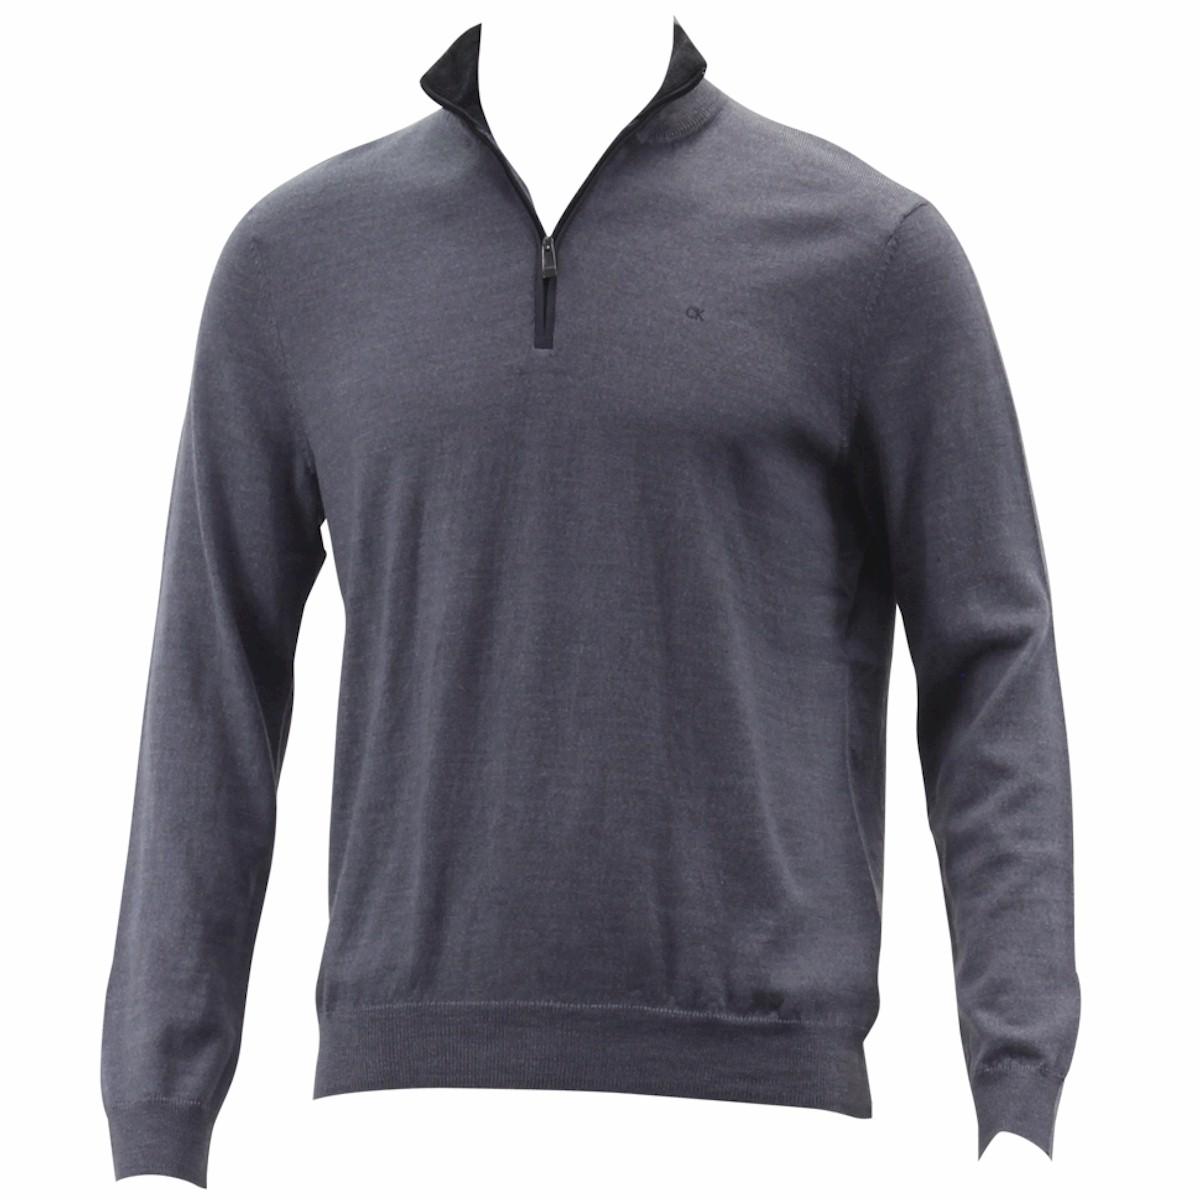 Calvin Klein Men s Merino End On End Long Sleeve 3 4 Zip Sweater Merino End On End; 401S304